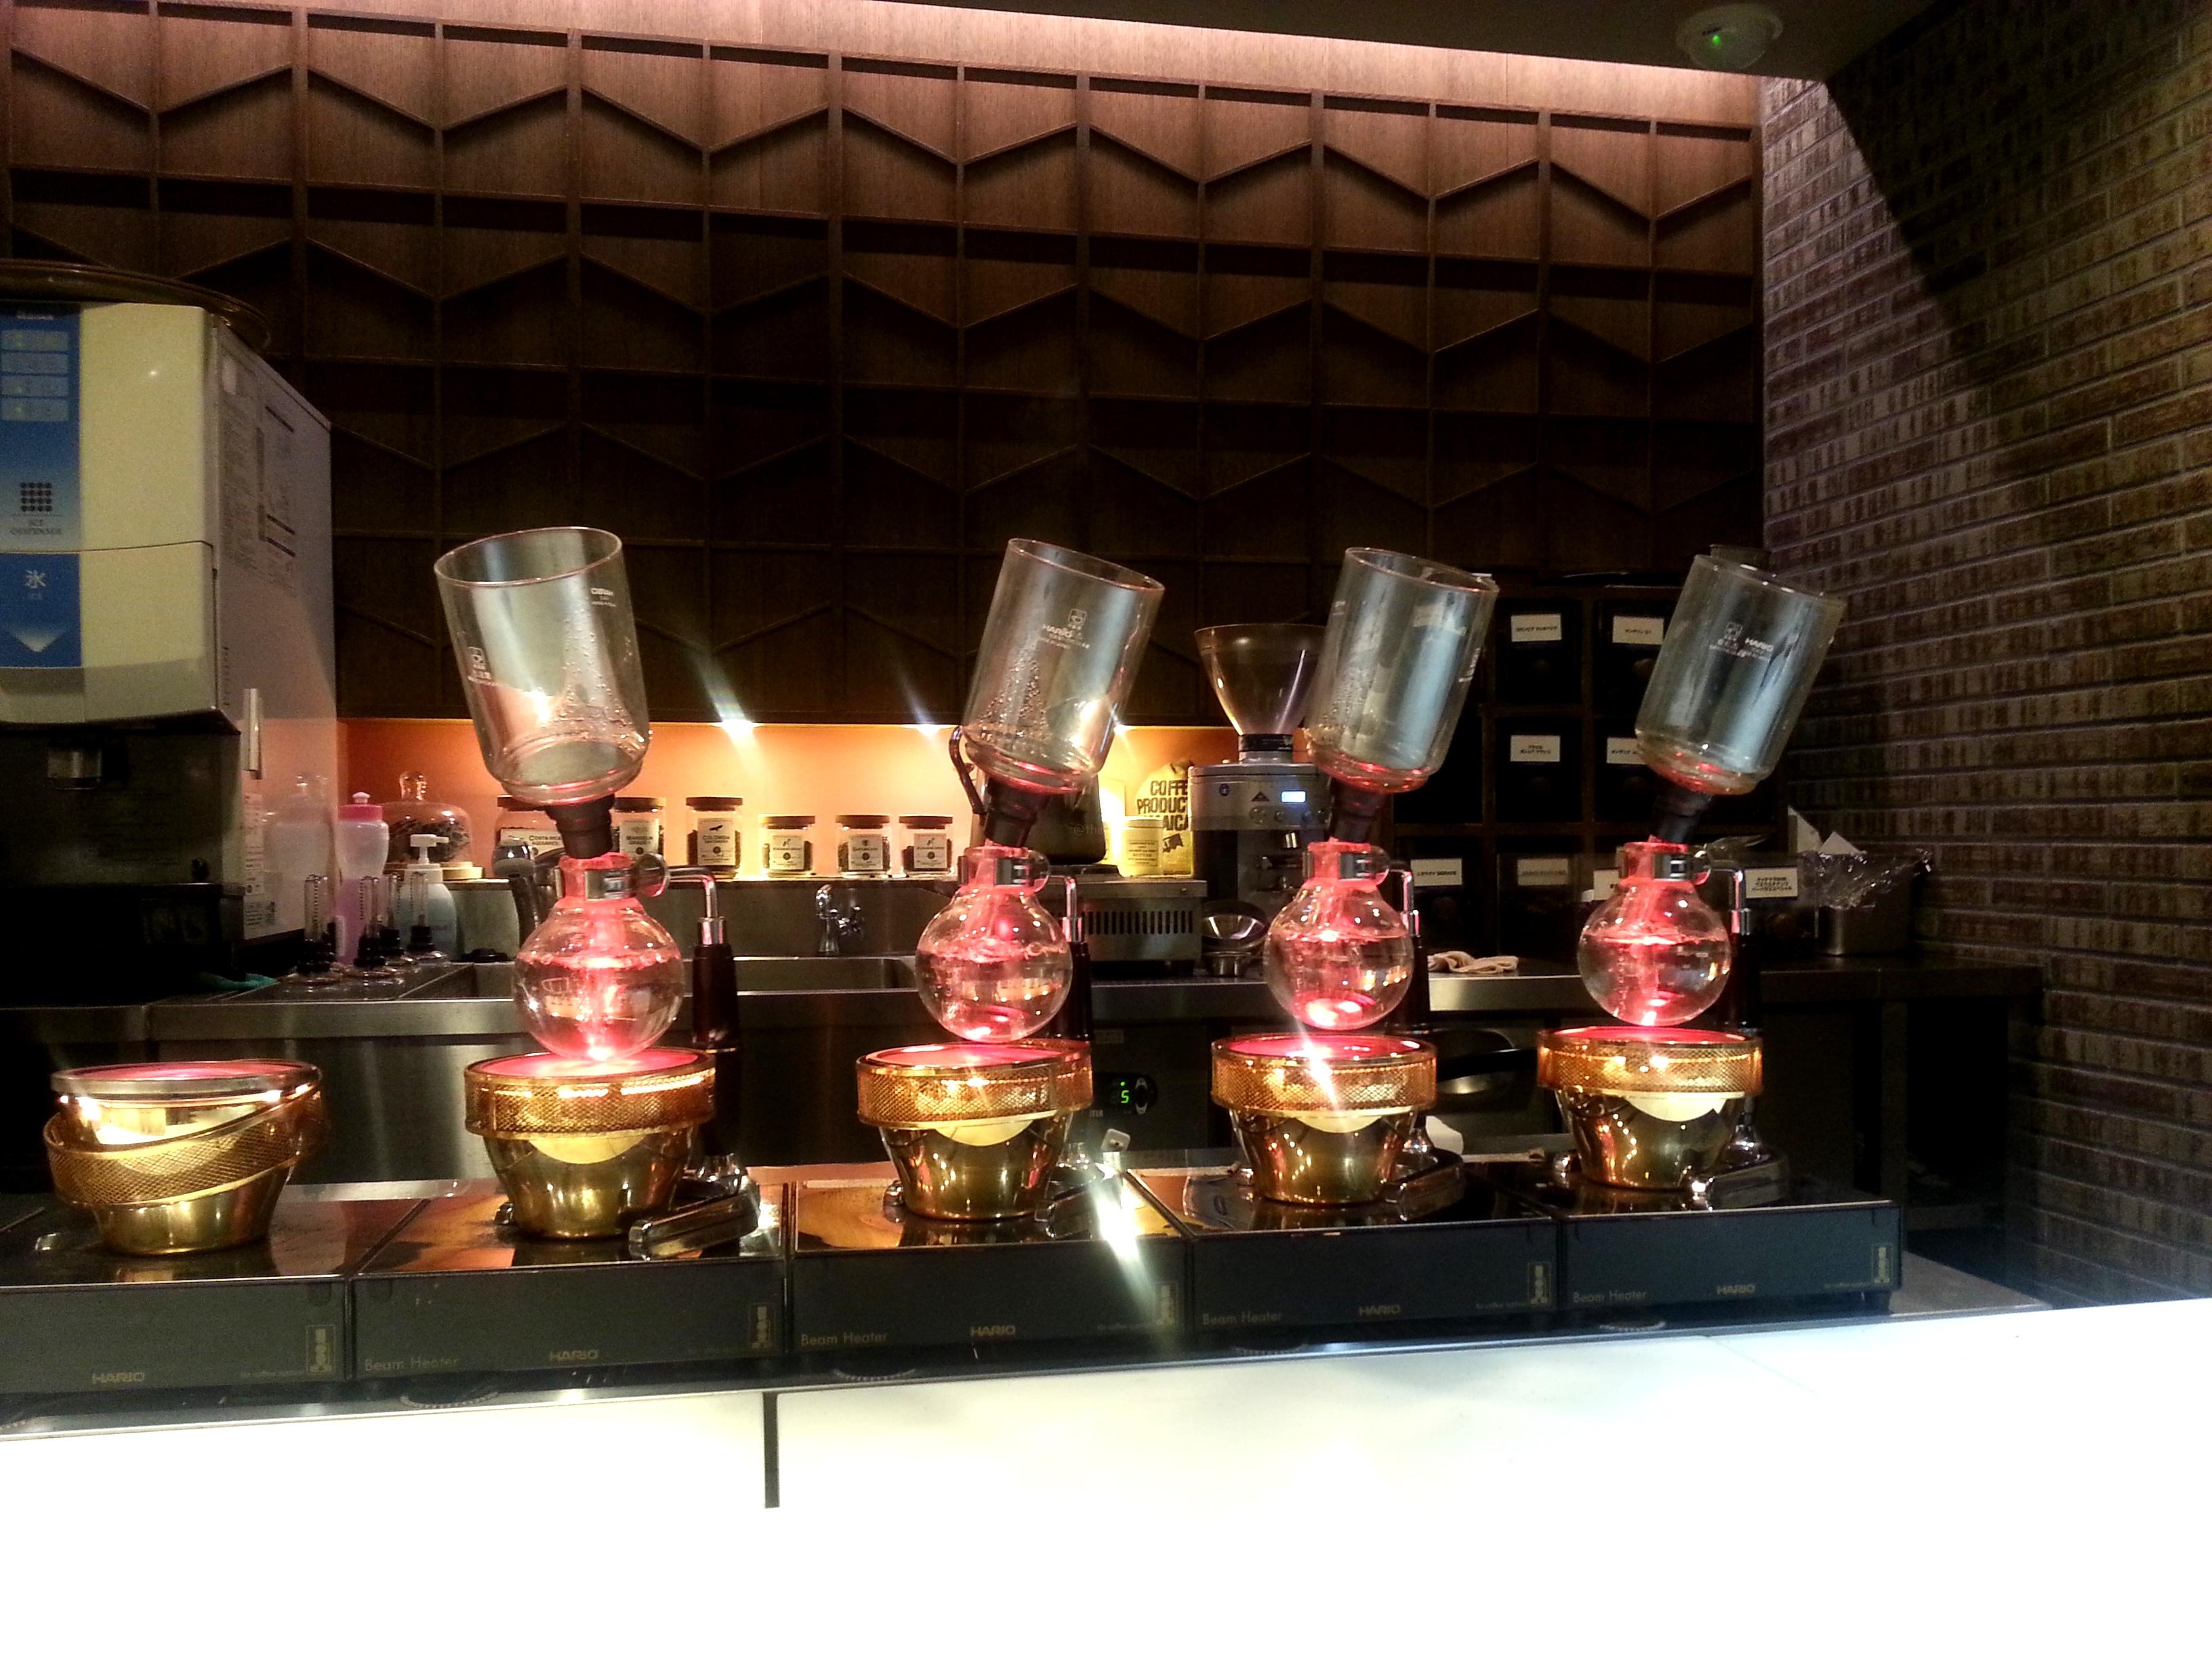 Kurashiki Coffee (倉式珈琲): Siphon Coffee Equipments